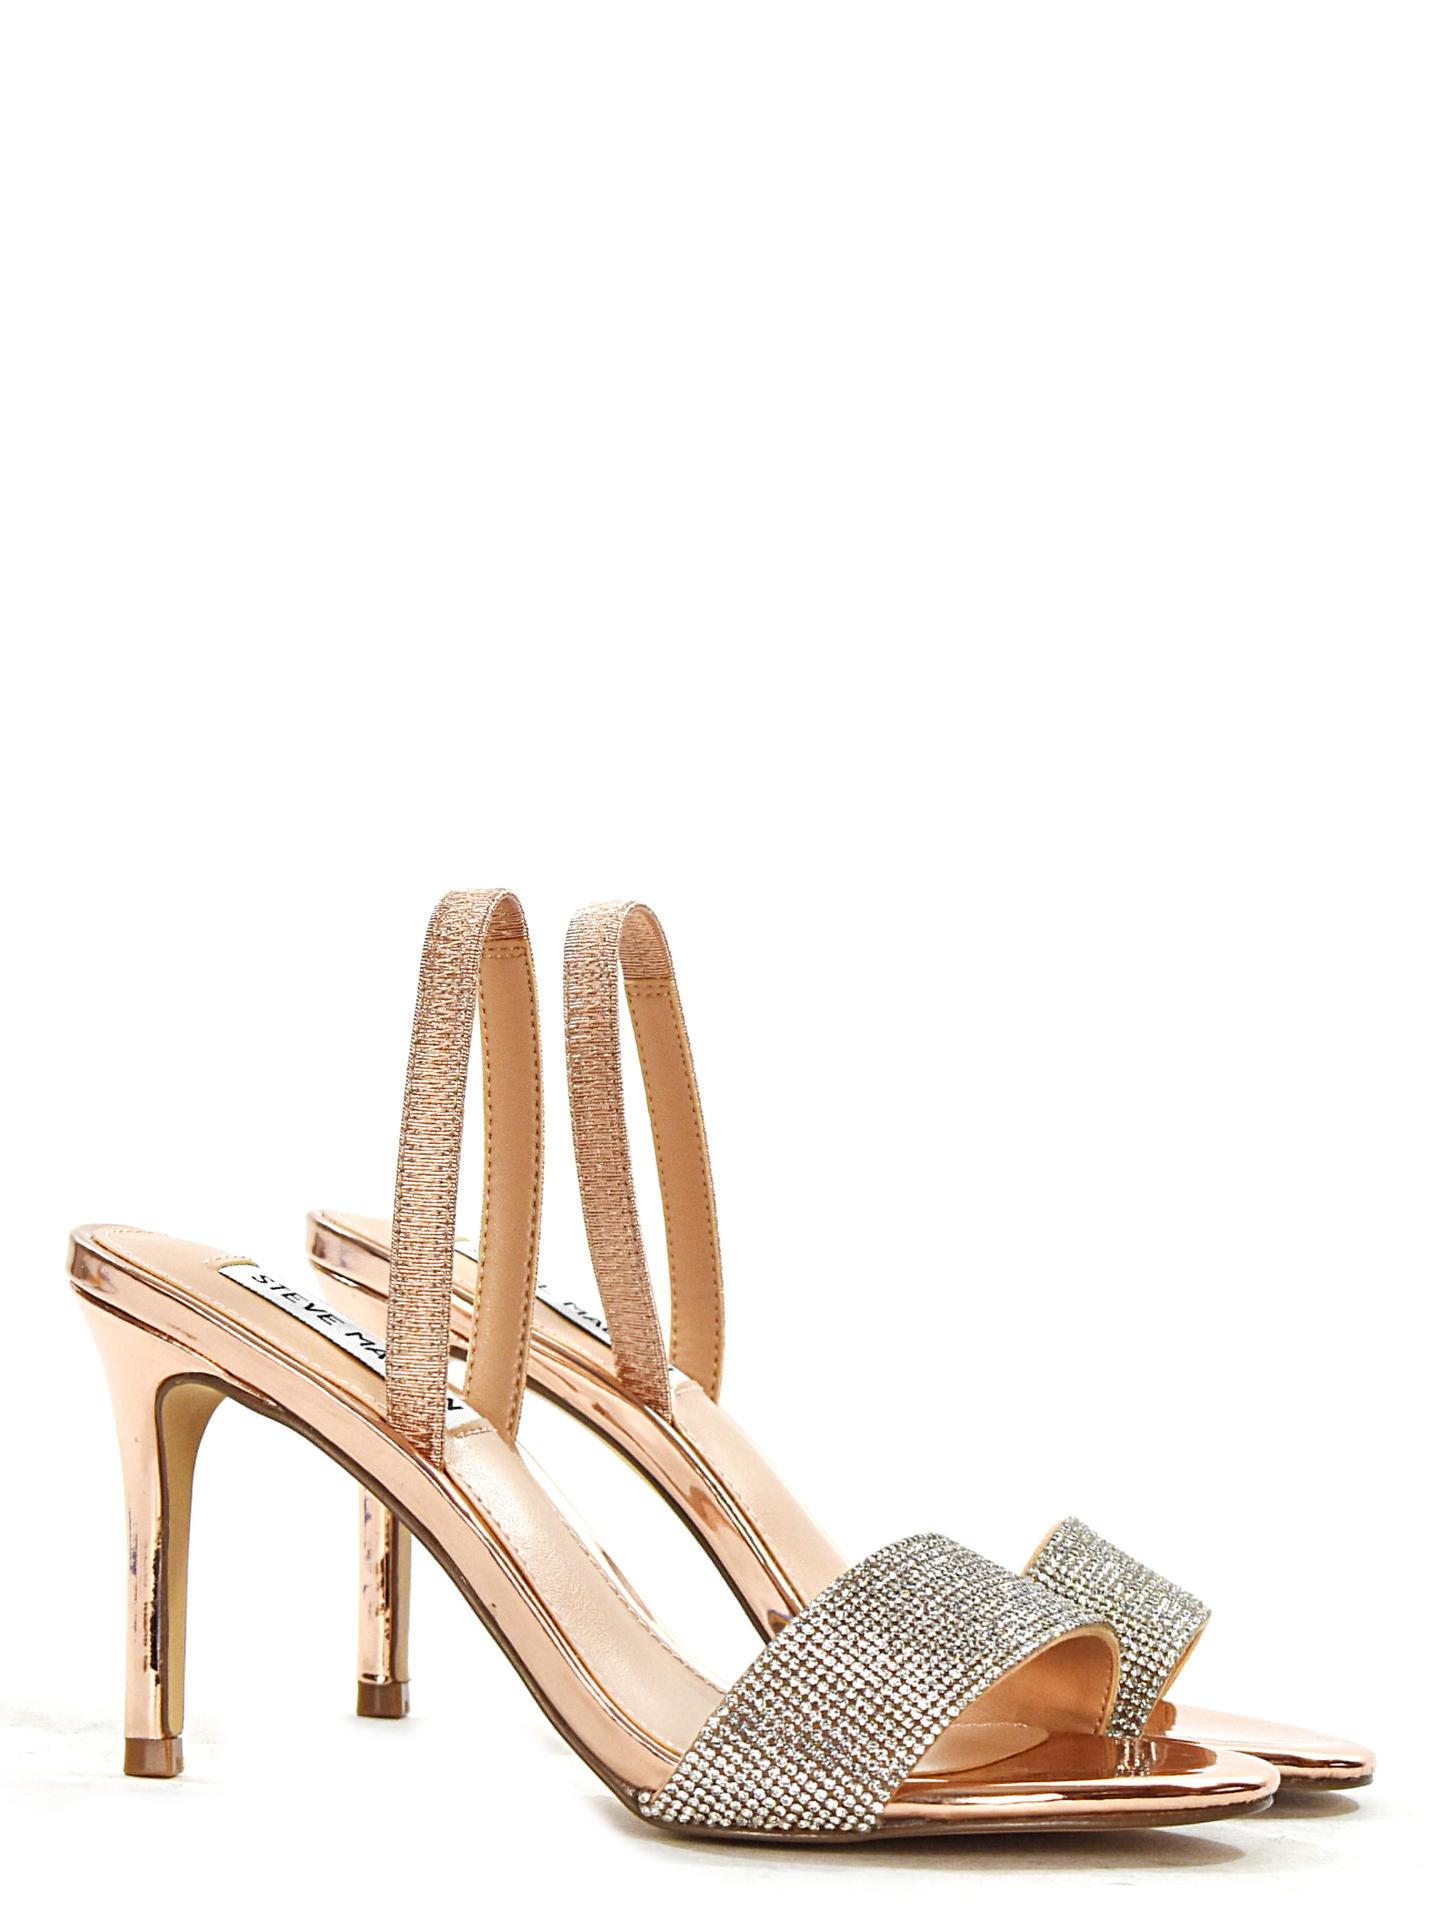 Sandali Glitter Zara, n.41 in 40131 Bologna für € 15,00